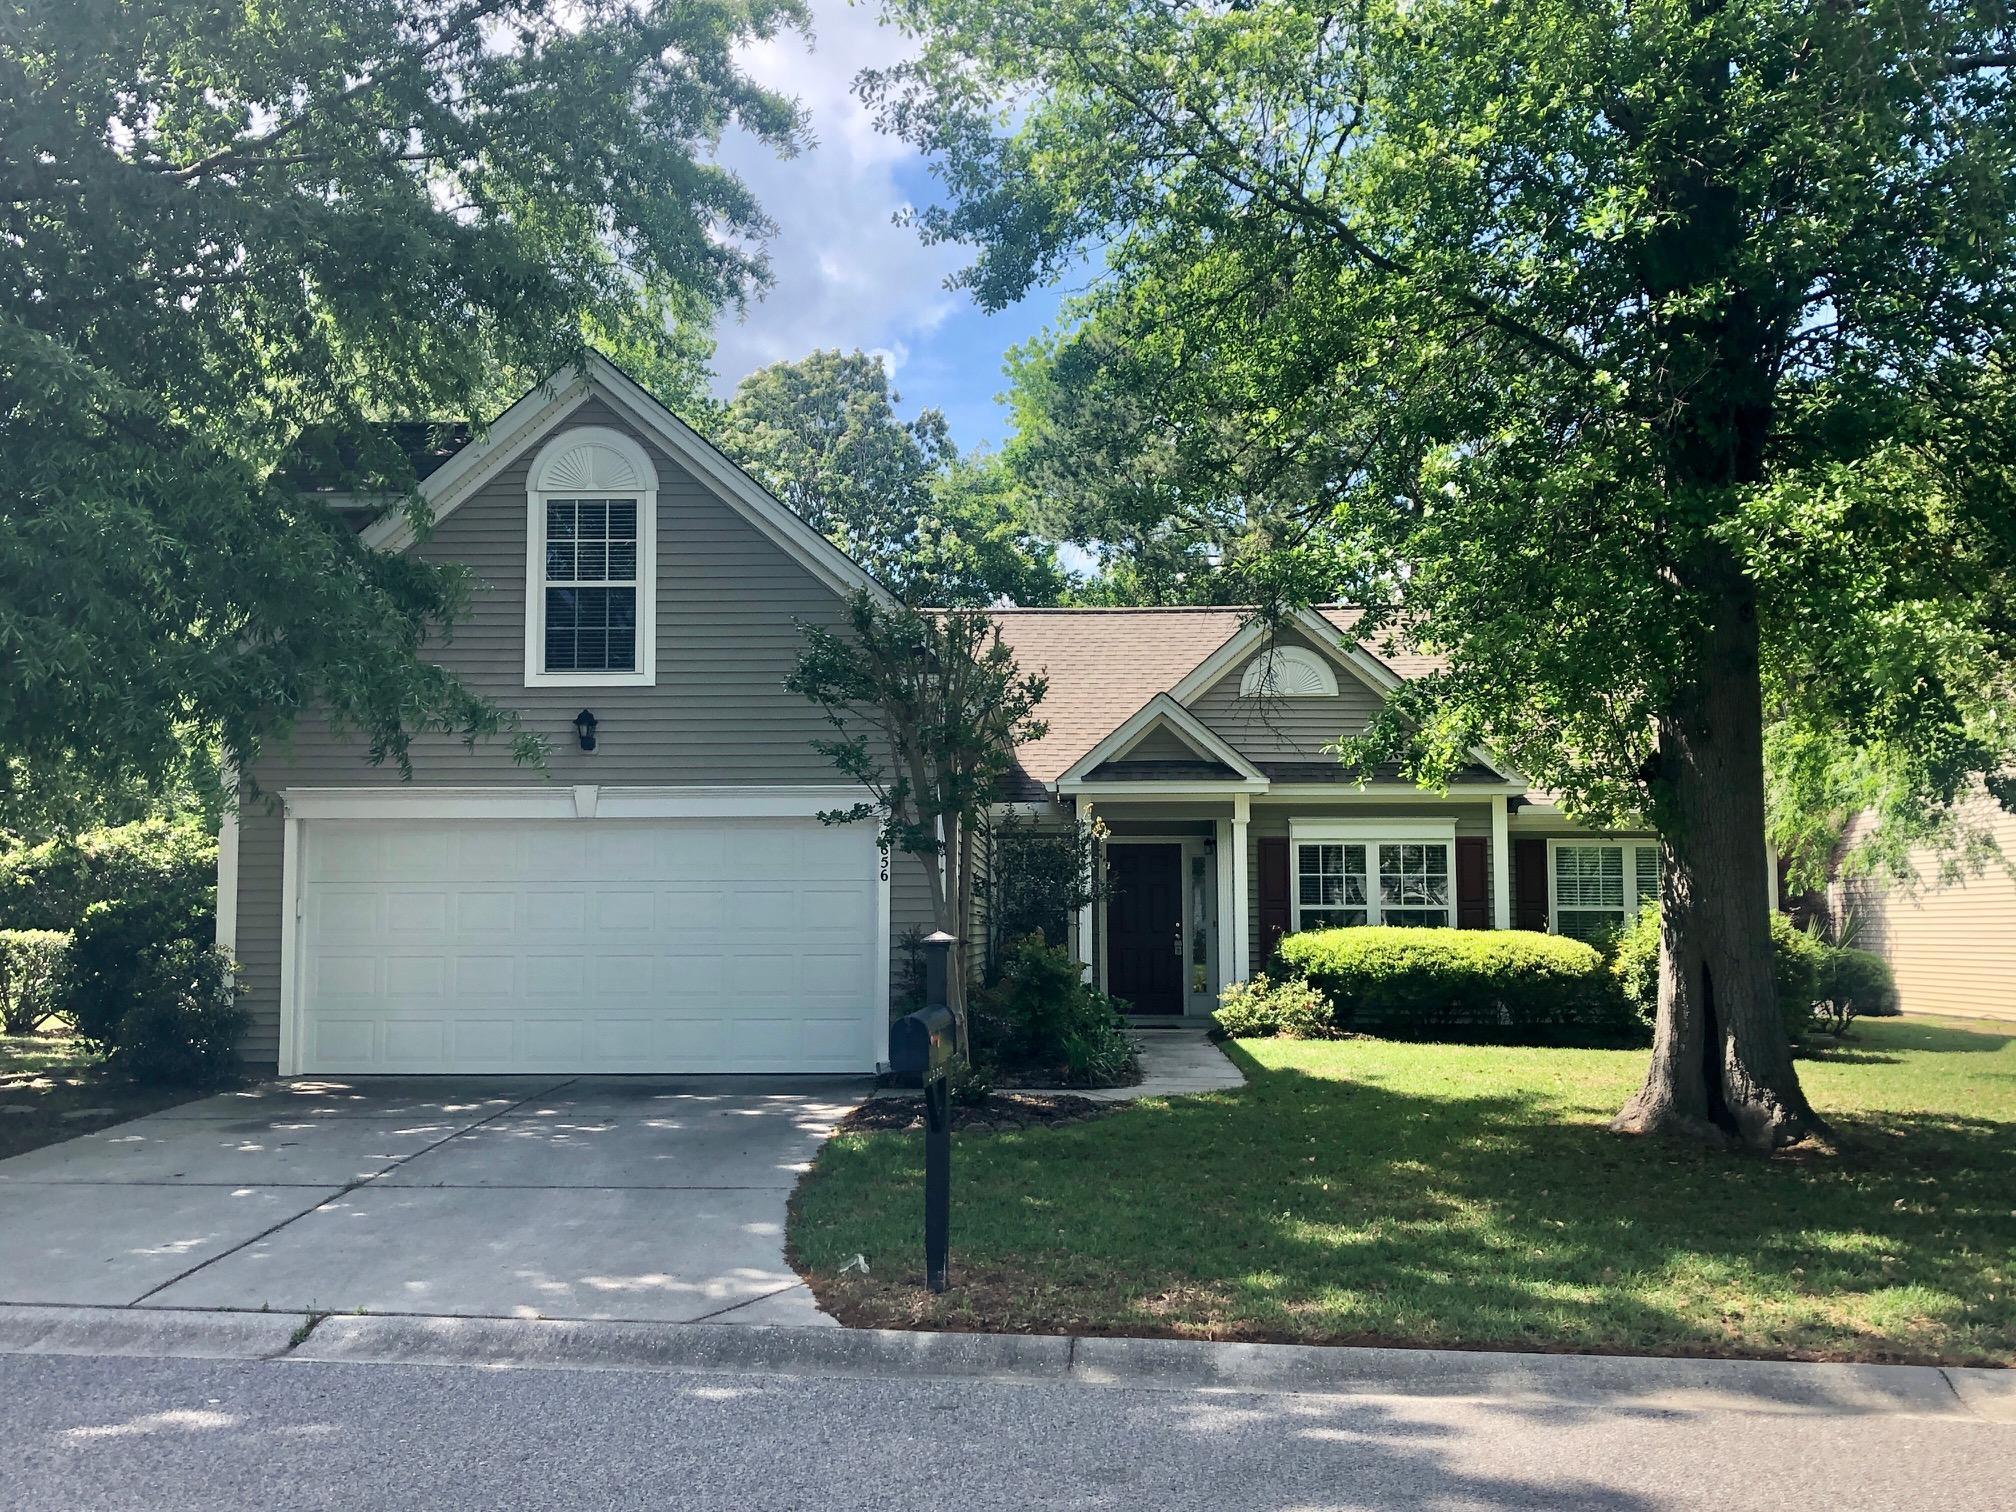 Planters Pointe Homes For Sale - 2856 Curran, Mount Pleasant, SC - 41